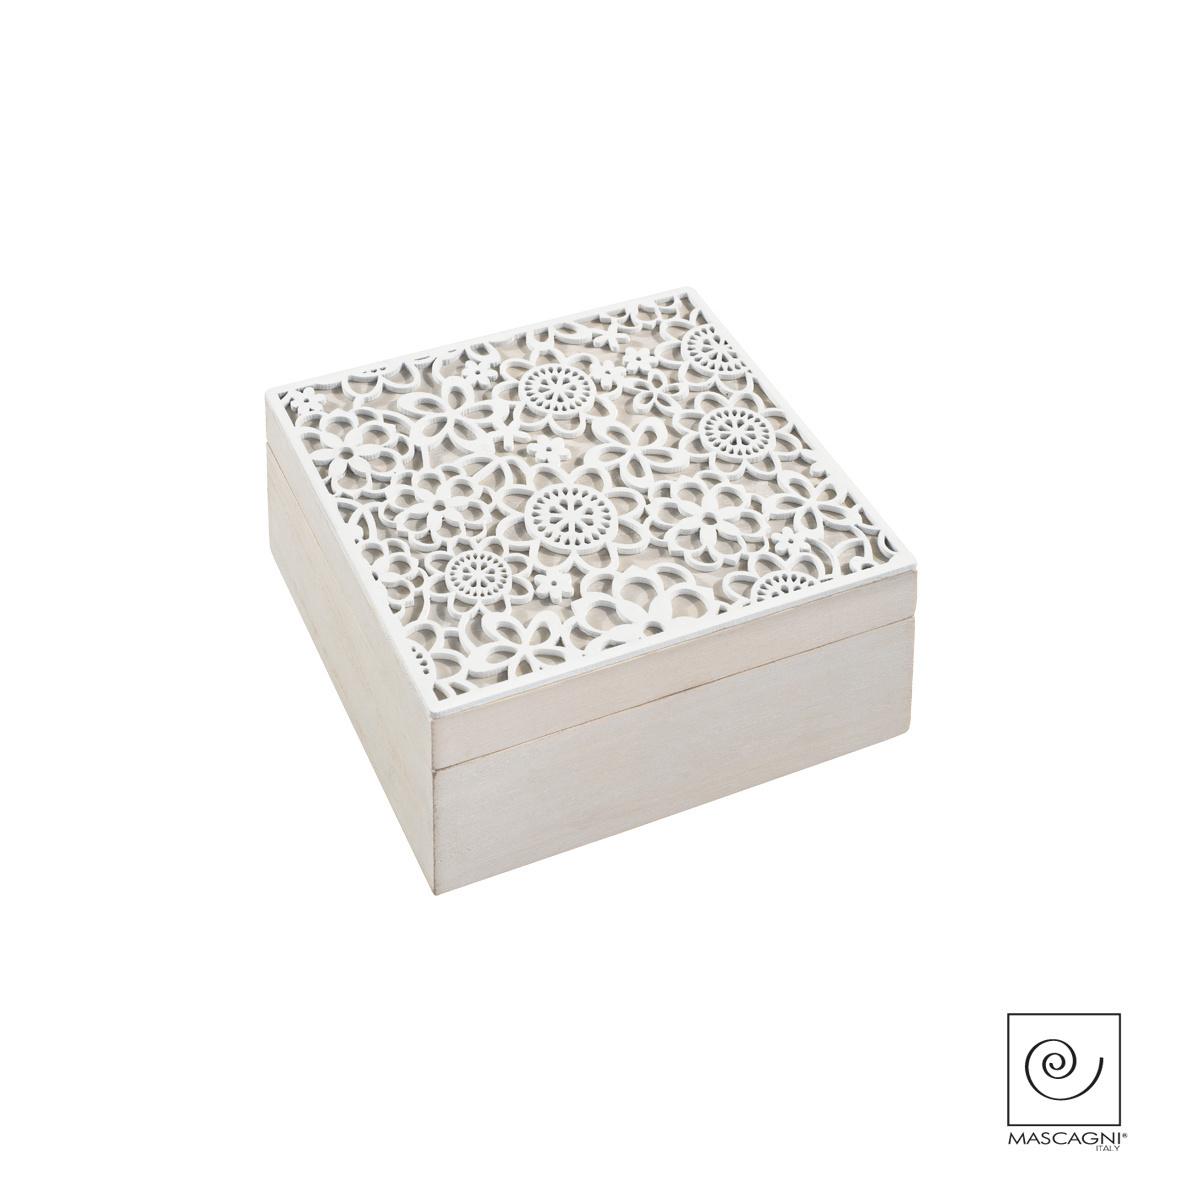 Art Mascagni A774 BOX THE